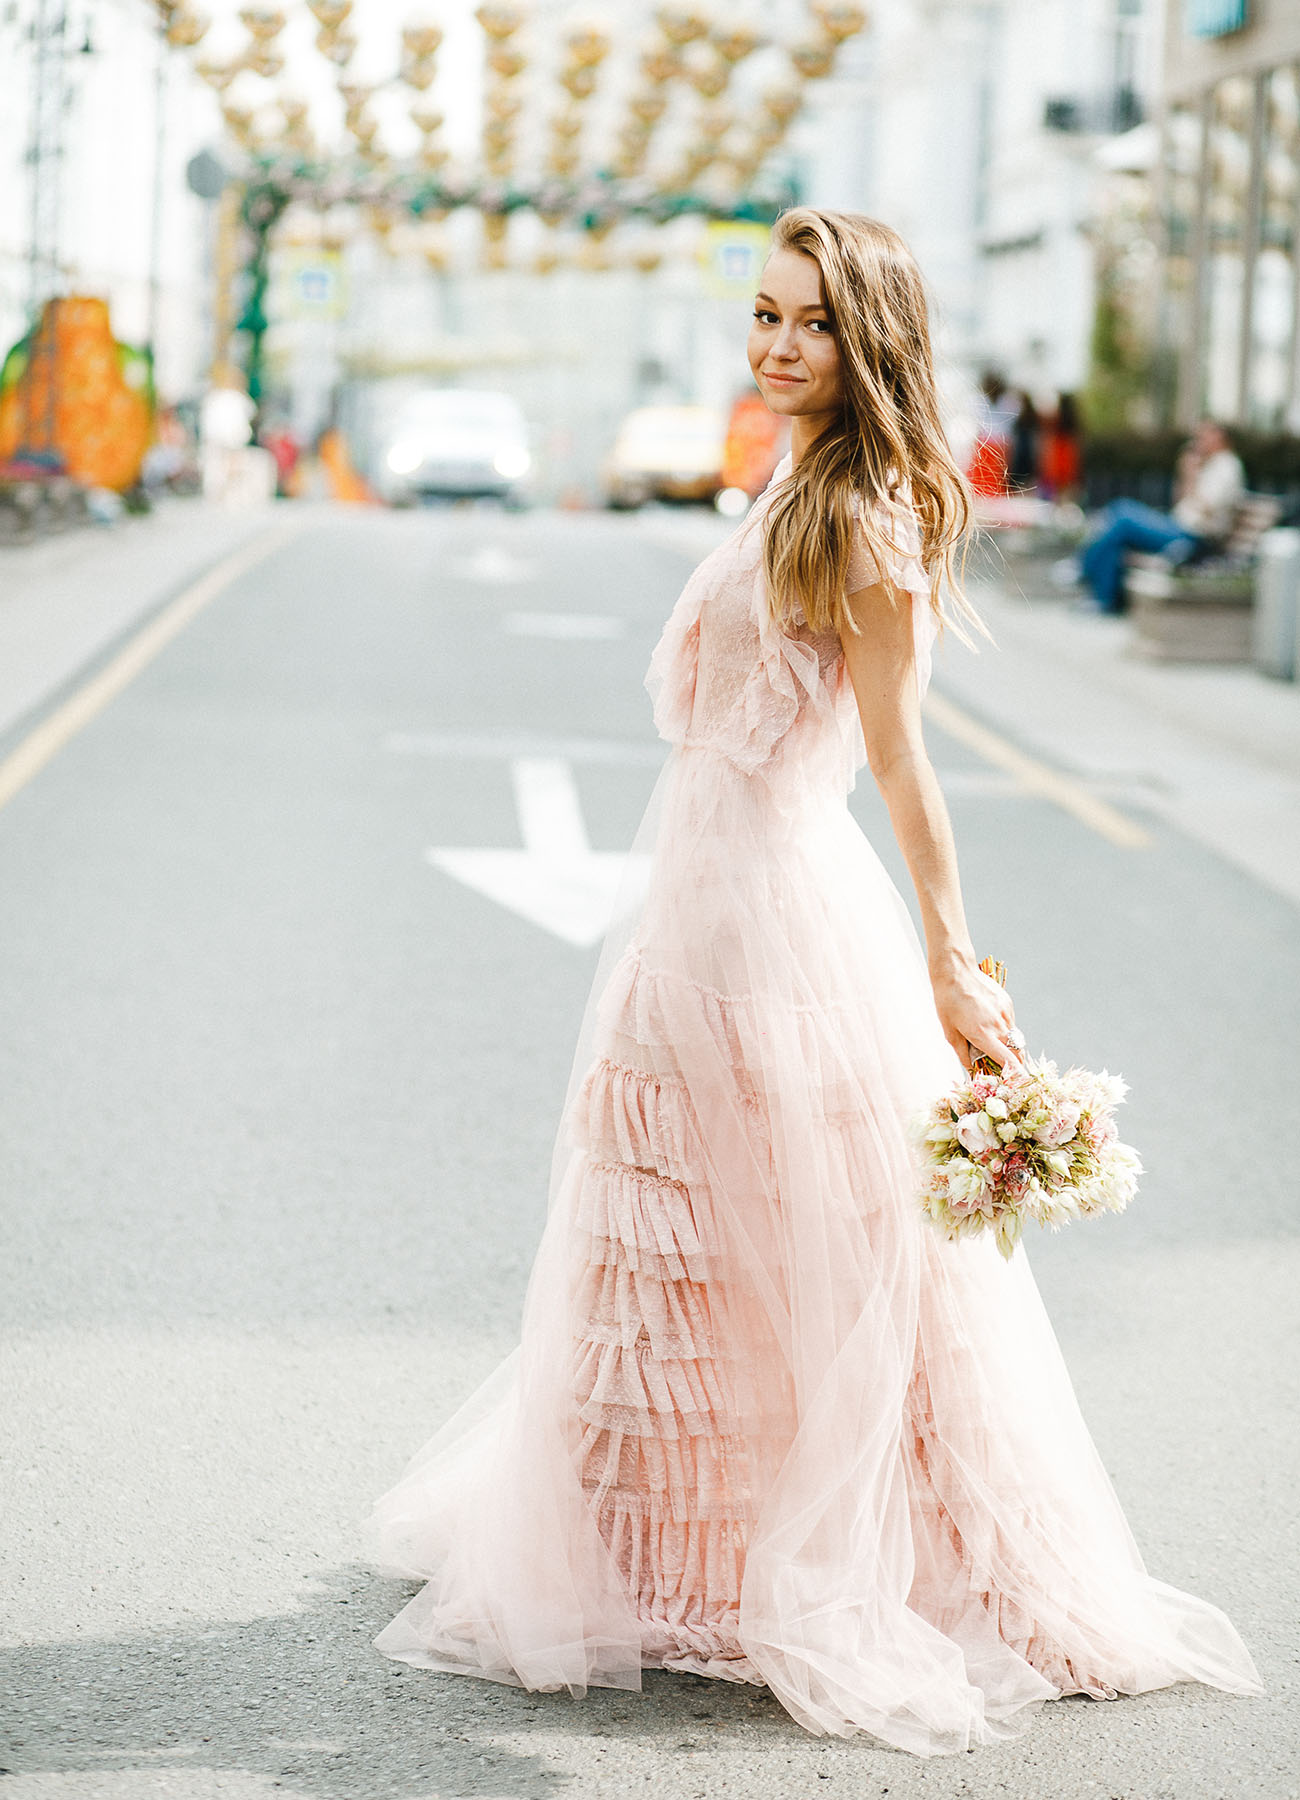 Licht roze trouwjurk